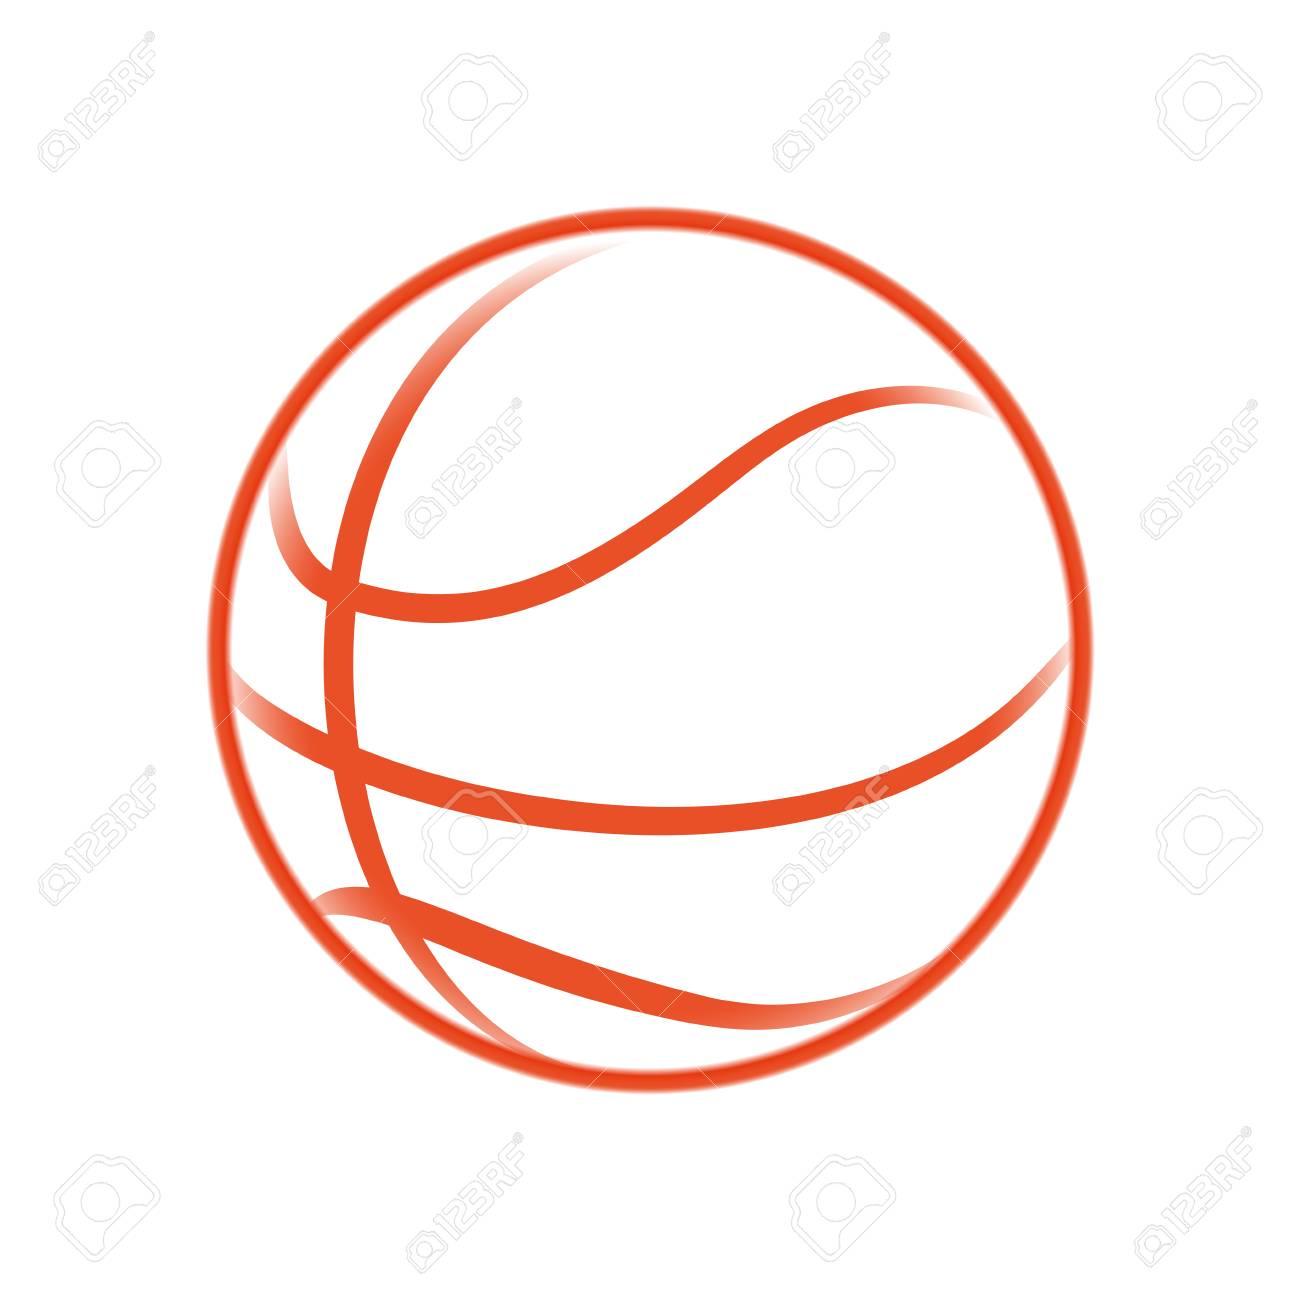 Basketball Ball Game Icon Vector Illustration Graphic Design Royalty